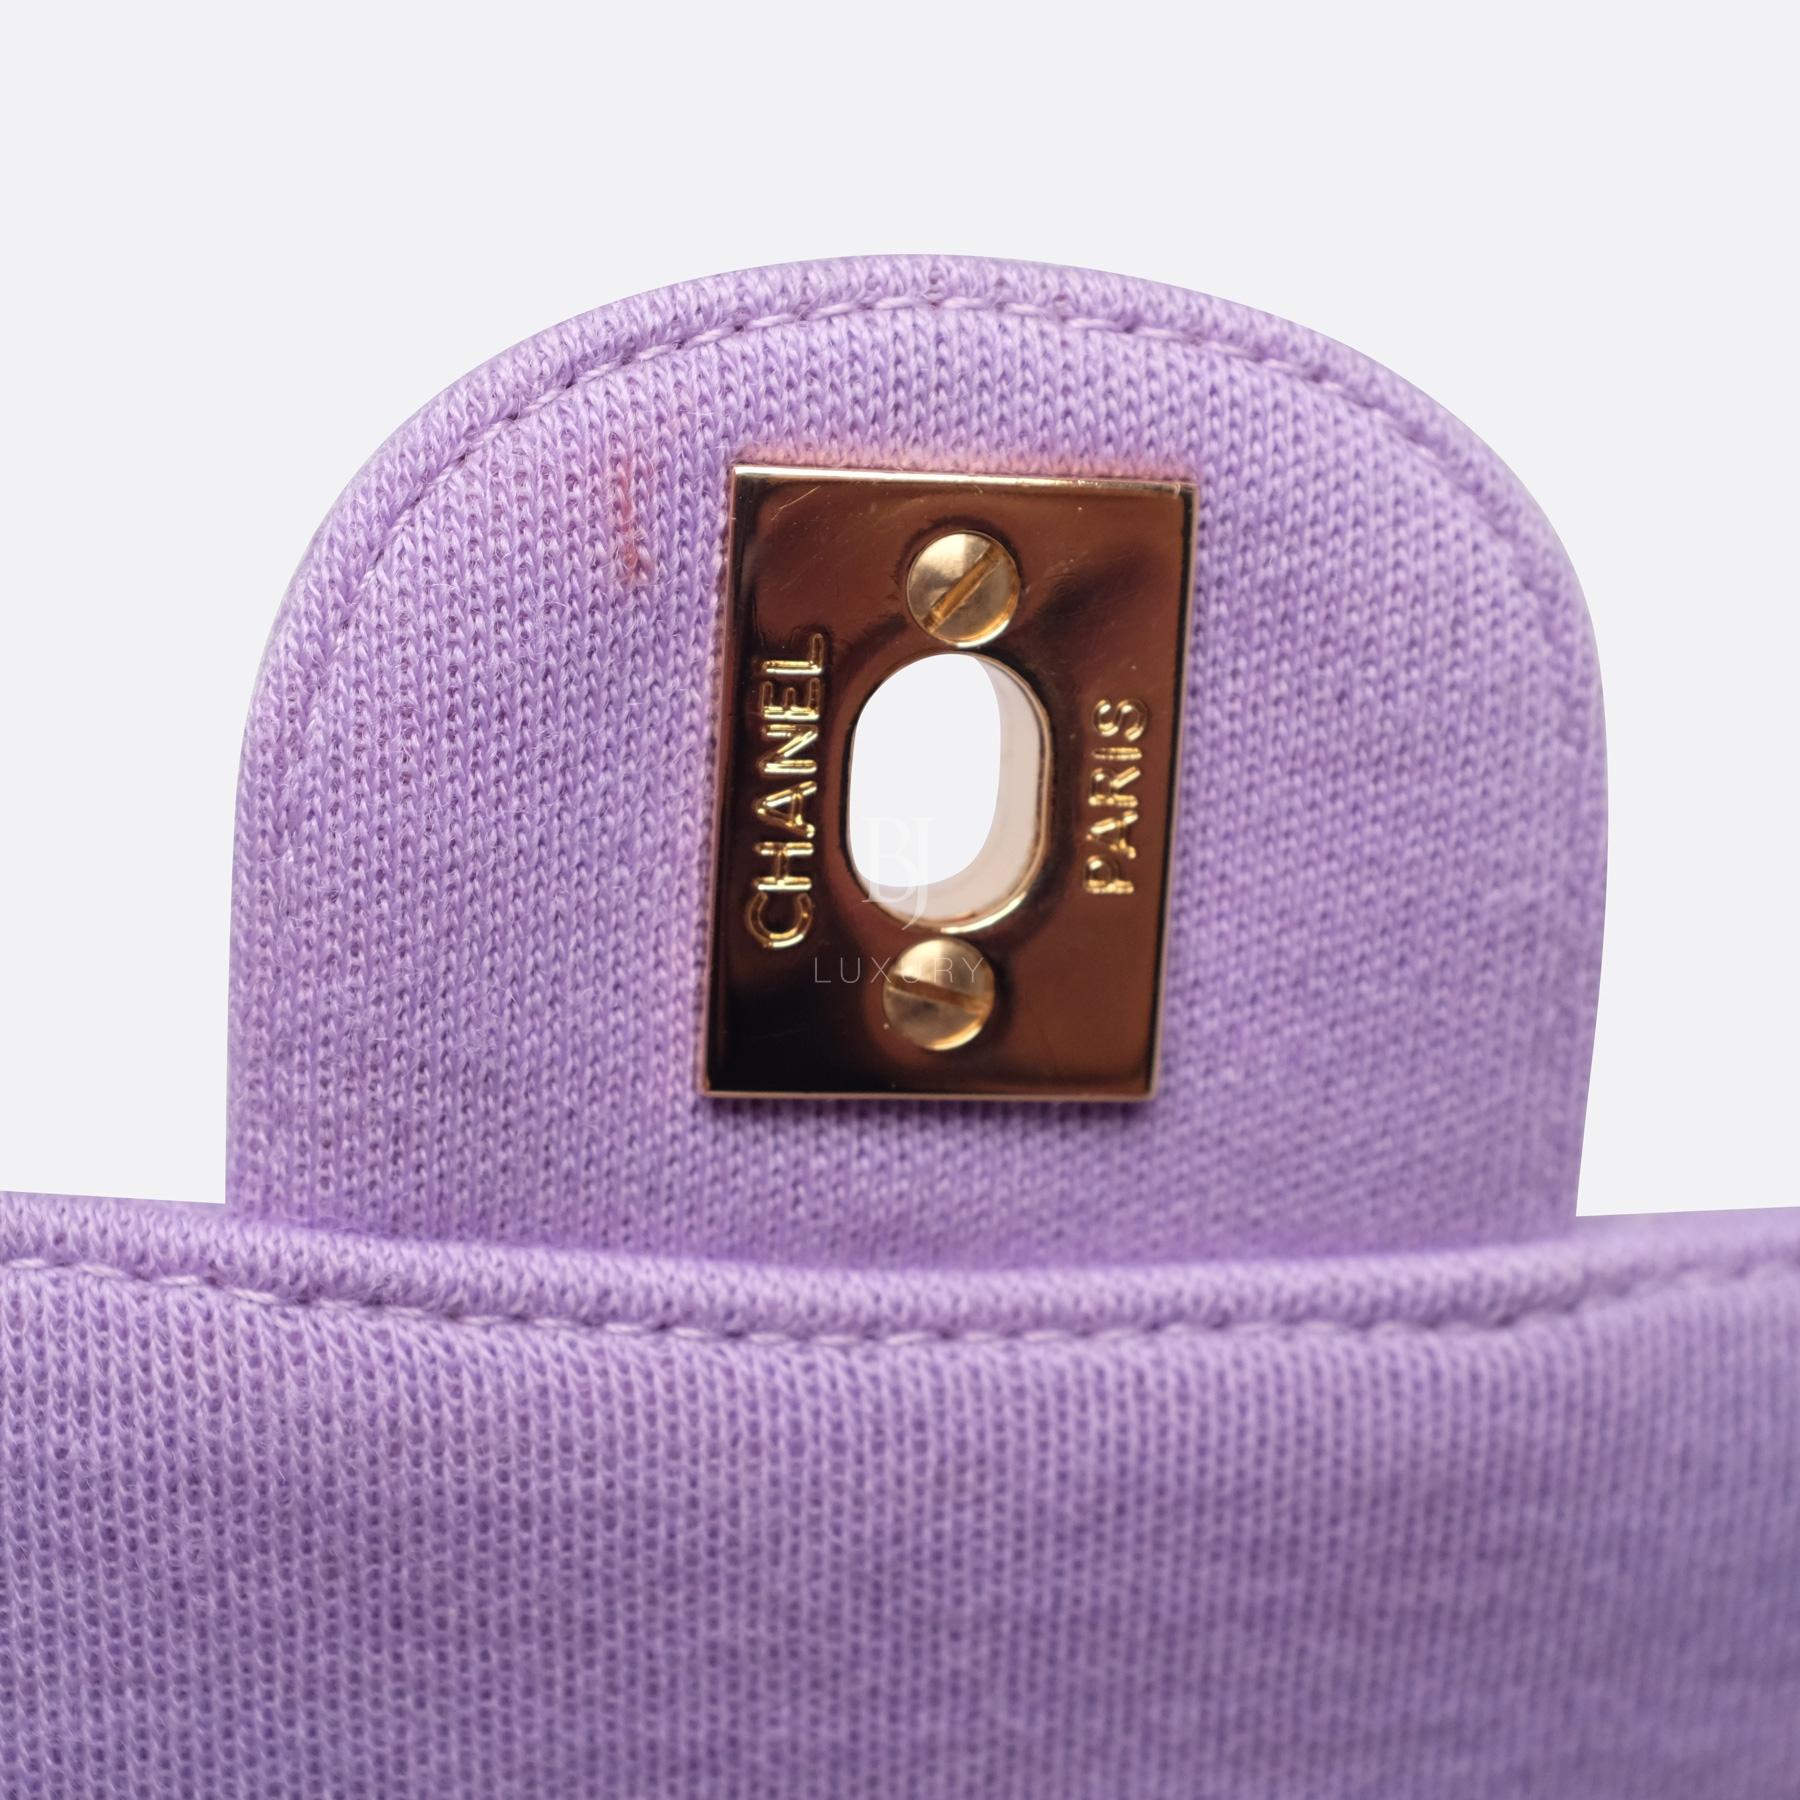 Chanel Flap Bag Medium Jersey Gold Lilac BJ Luxury 14.jpg